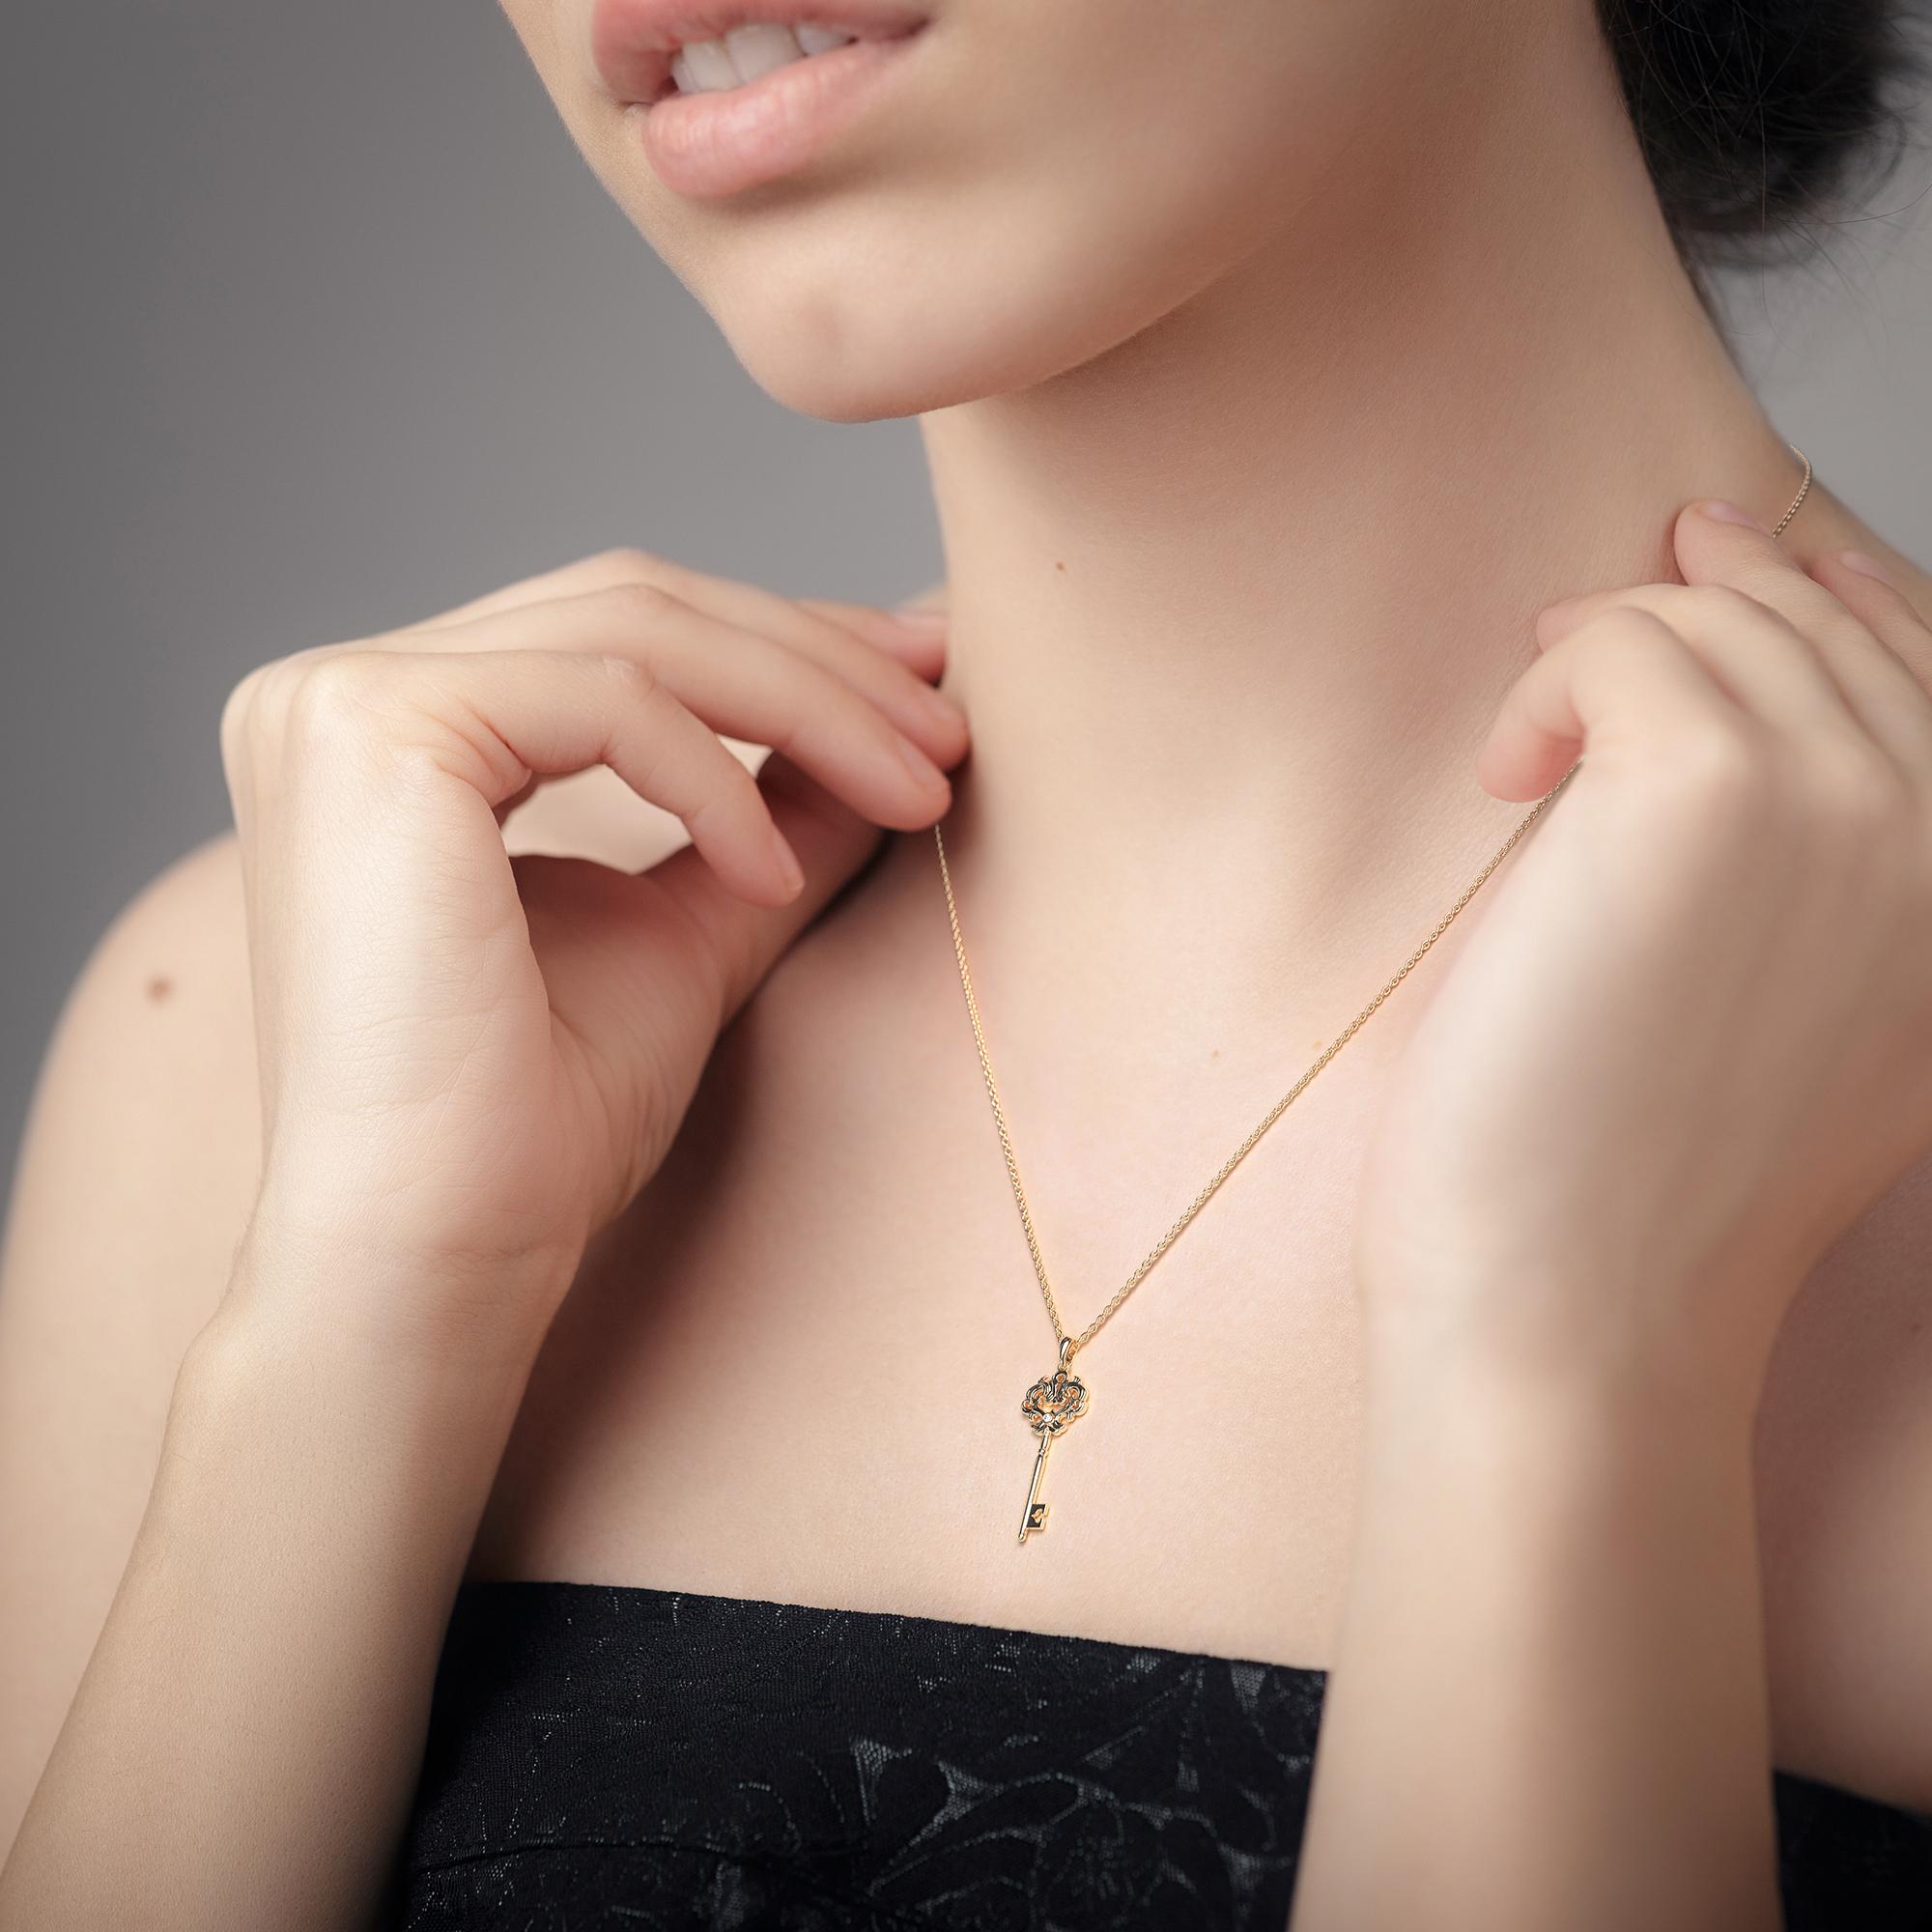 Diamond Key Vintage Inspired Pendant 14K Gold Necklace Fine Jewelry Womens Necklace